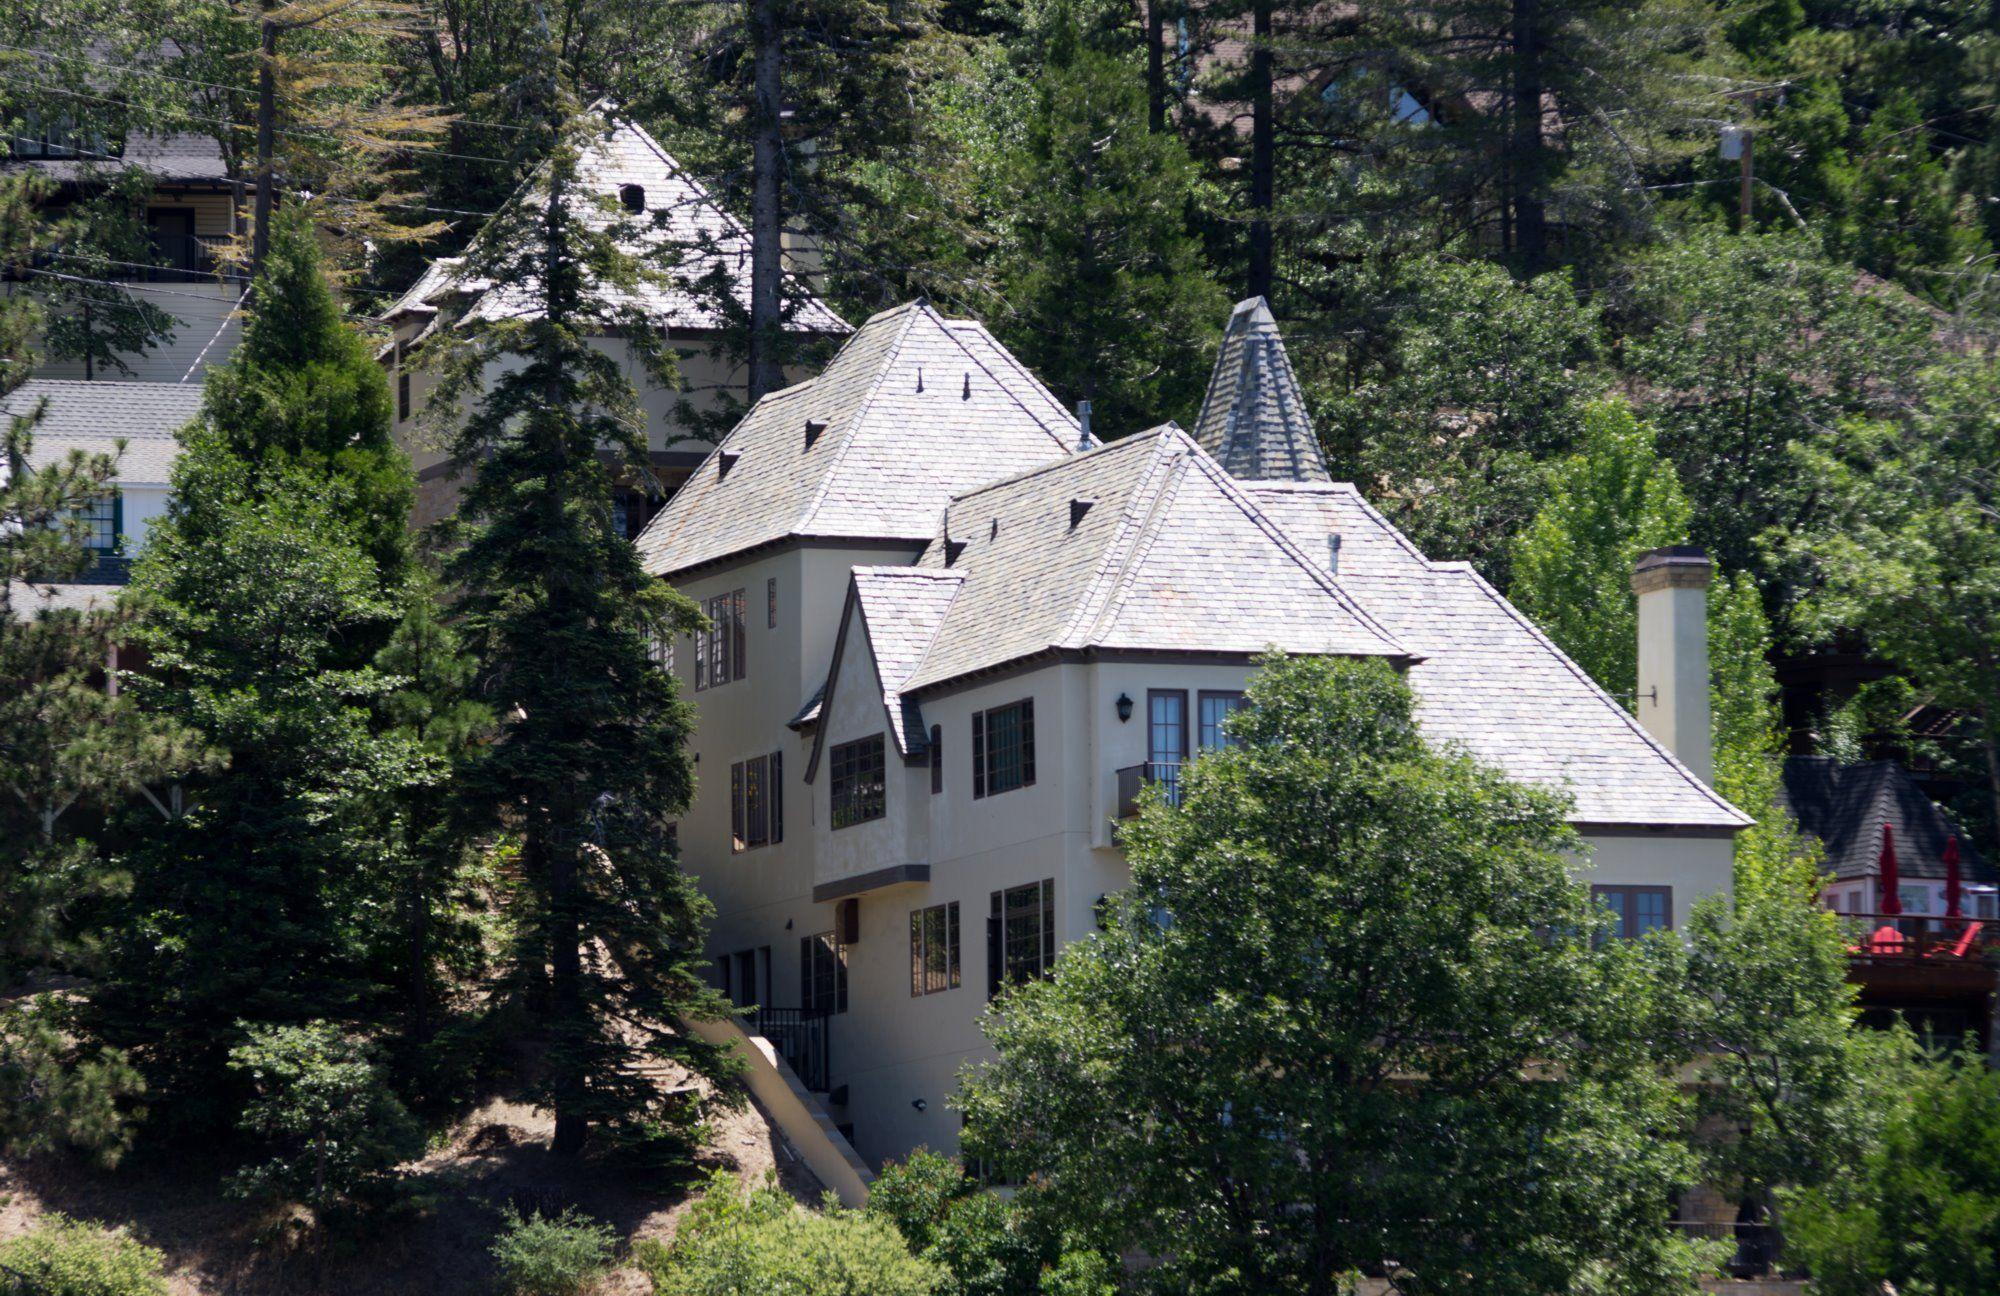 Sammy Hagar S Vacation Home Vacation Home Lake Arrowhead Celebrity Houses